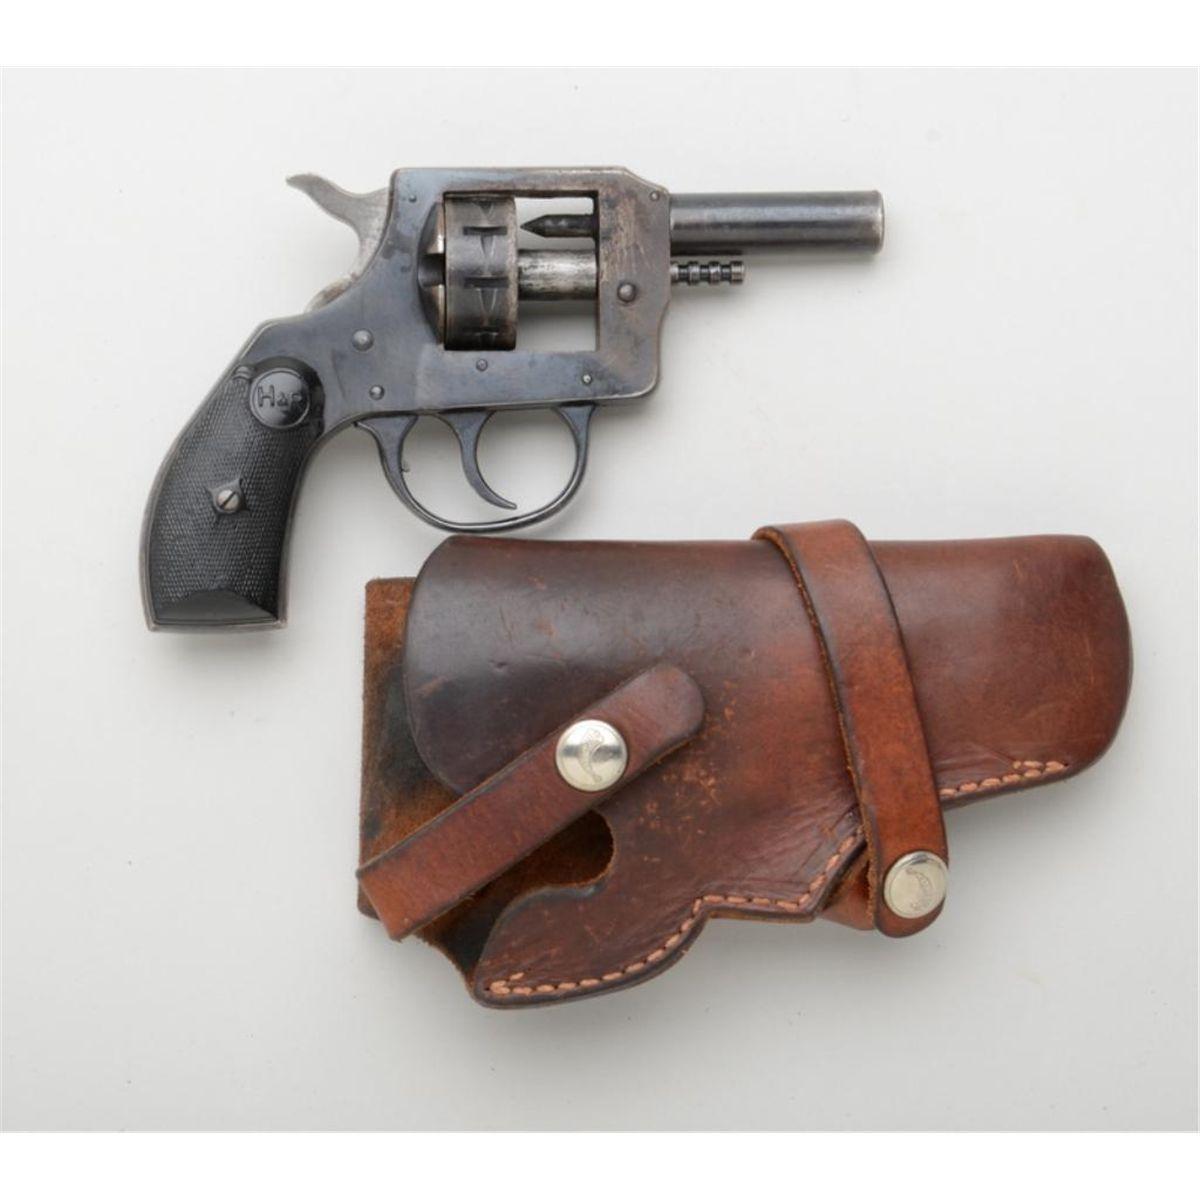 22 Revolver Blank Gun